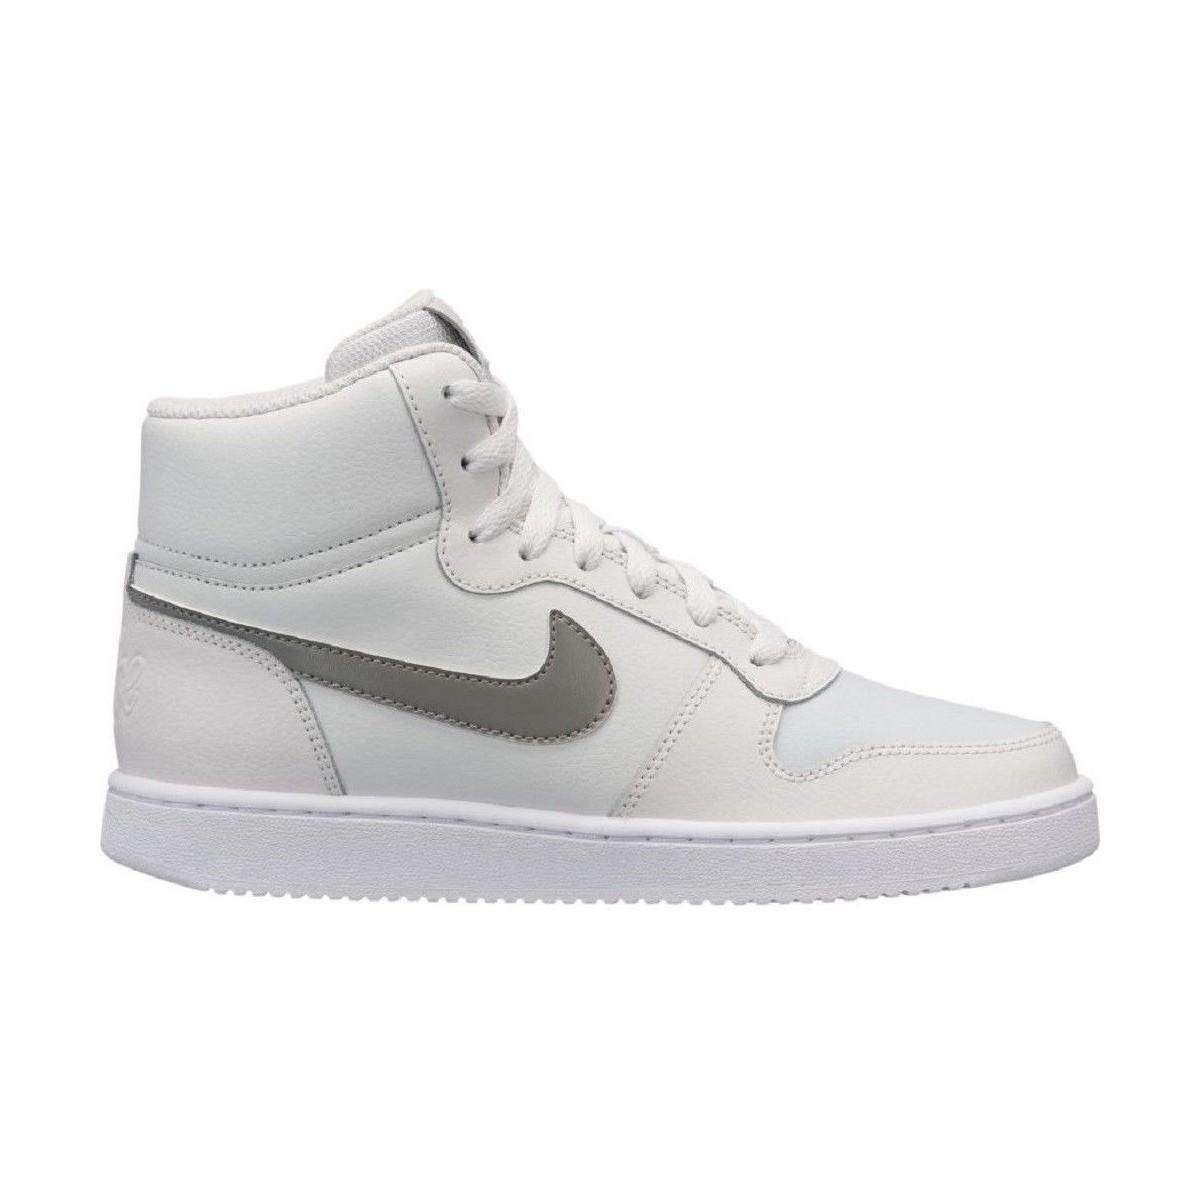 meet 397a3 6cc9c Nike. Aq1778 Ebernon Mid Women s Shoes (high-top Trainers) ...